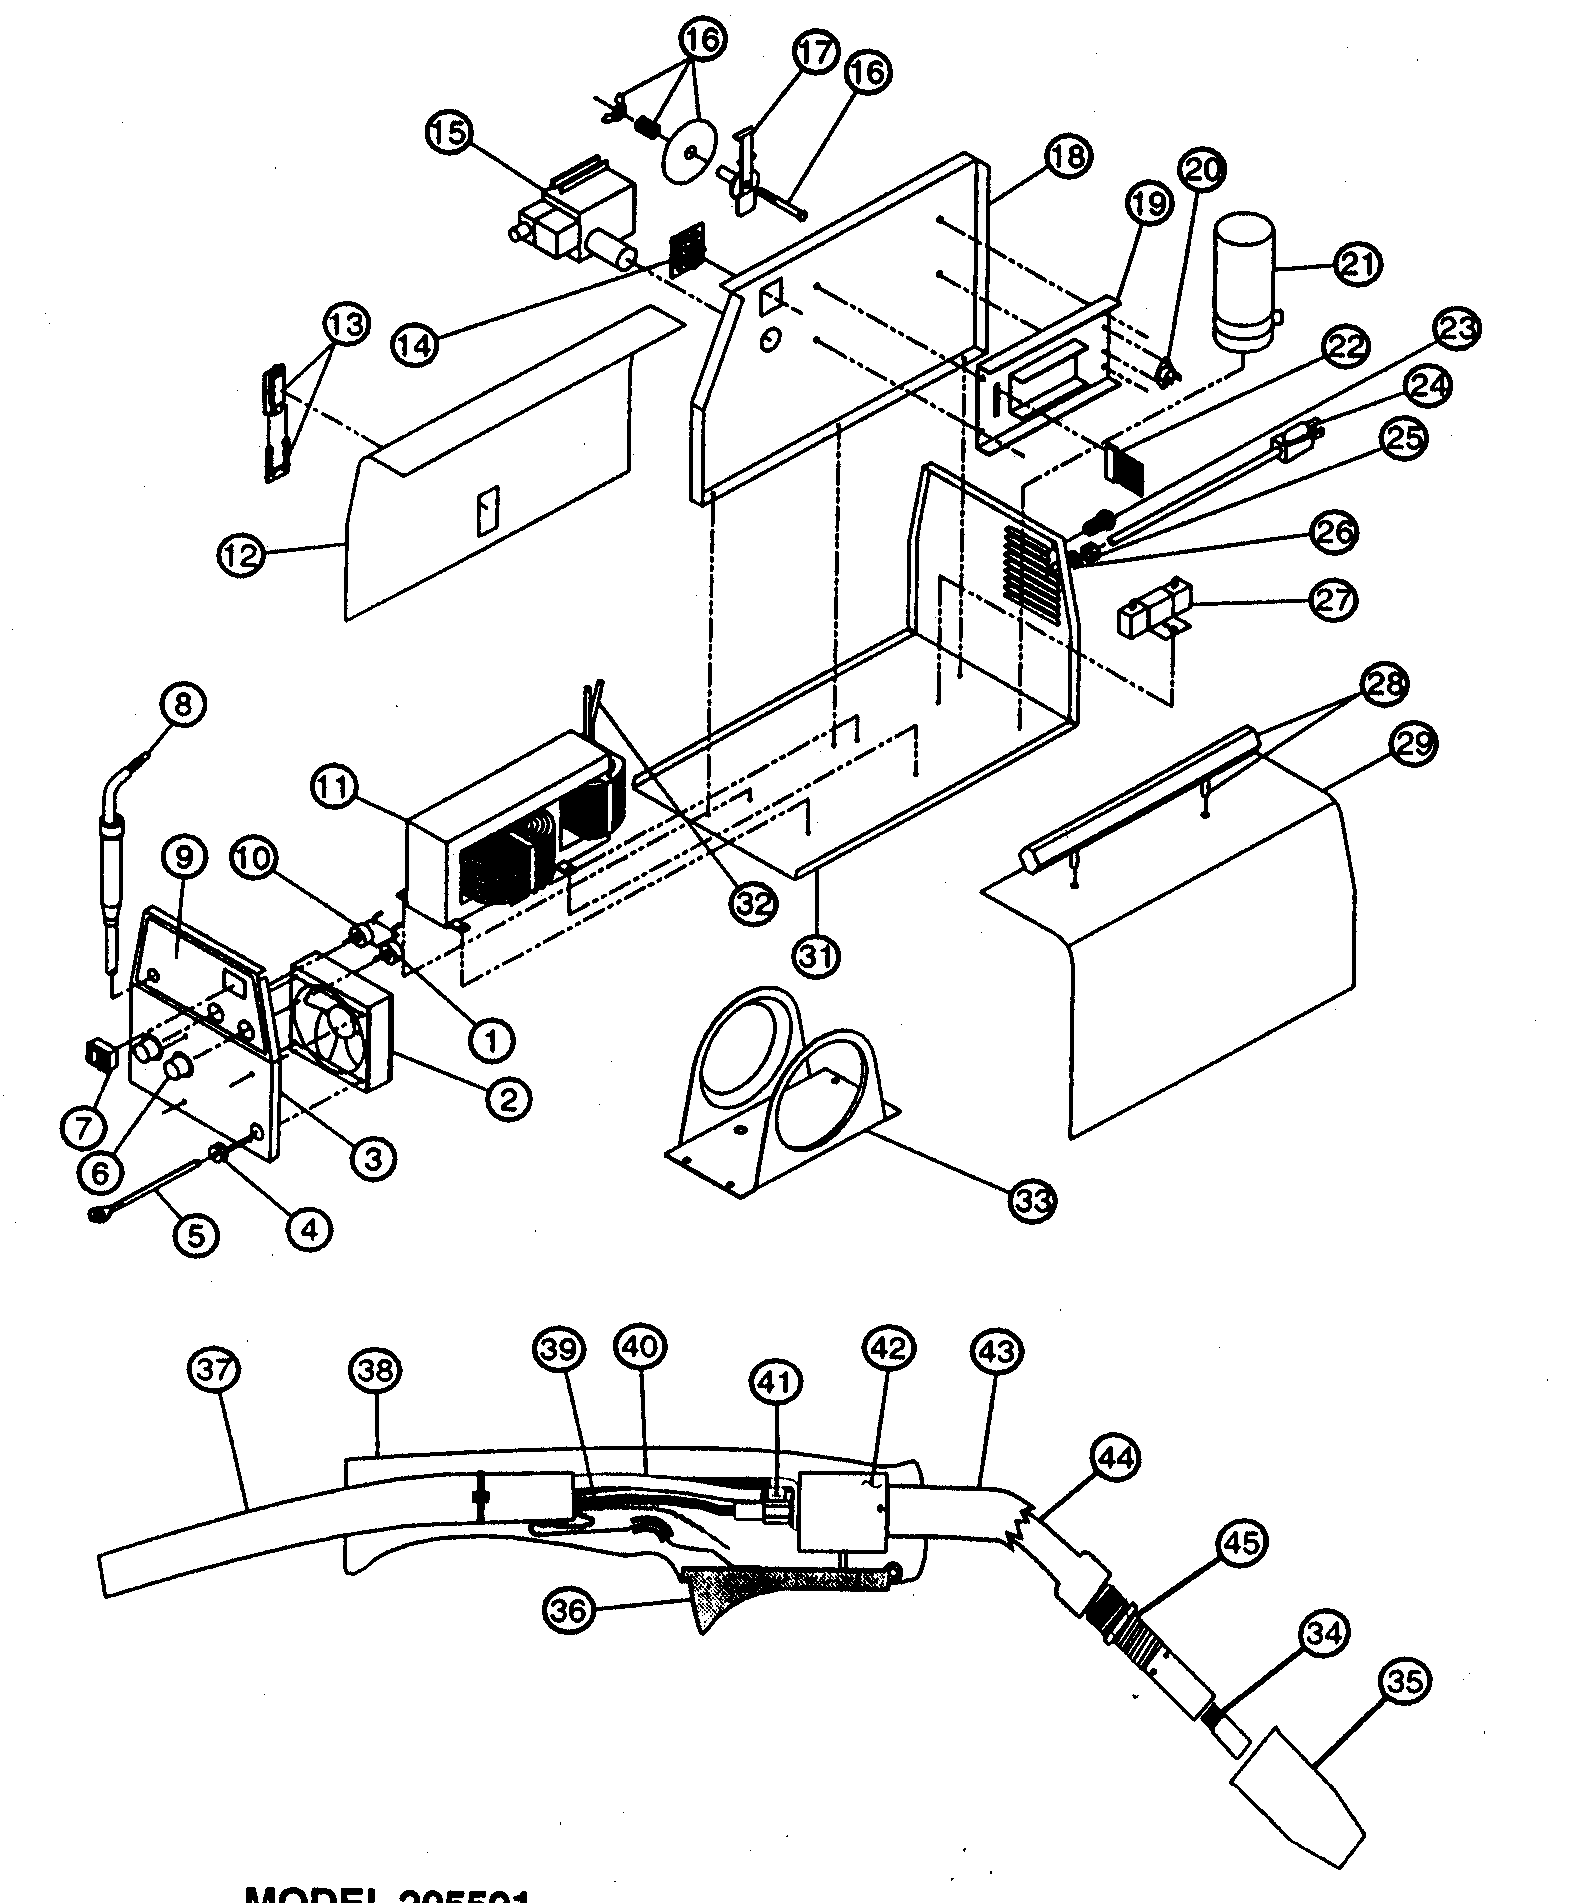 lincoln electric welder parts diagram split load consumer unit wiring craftsman mig model 934205591 sears